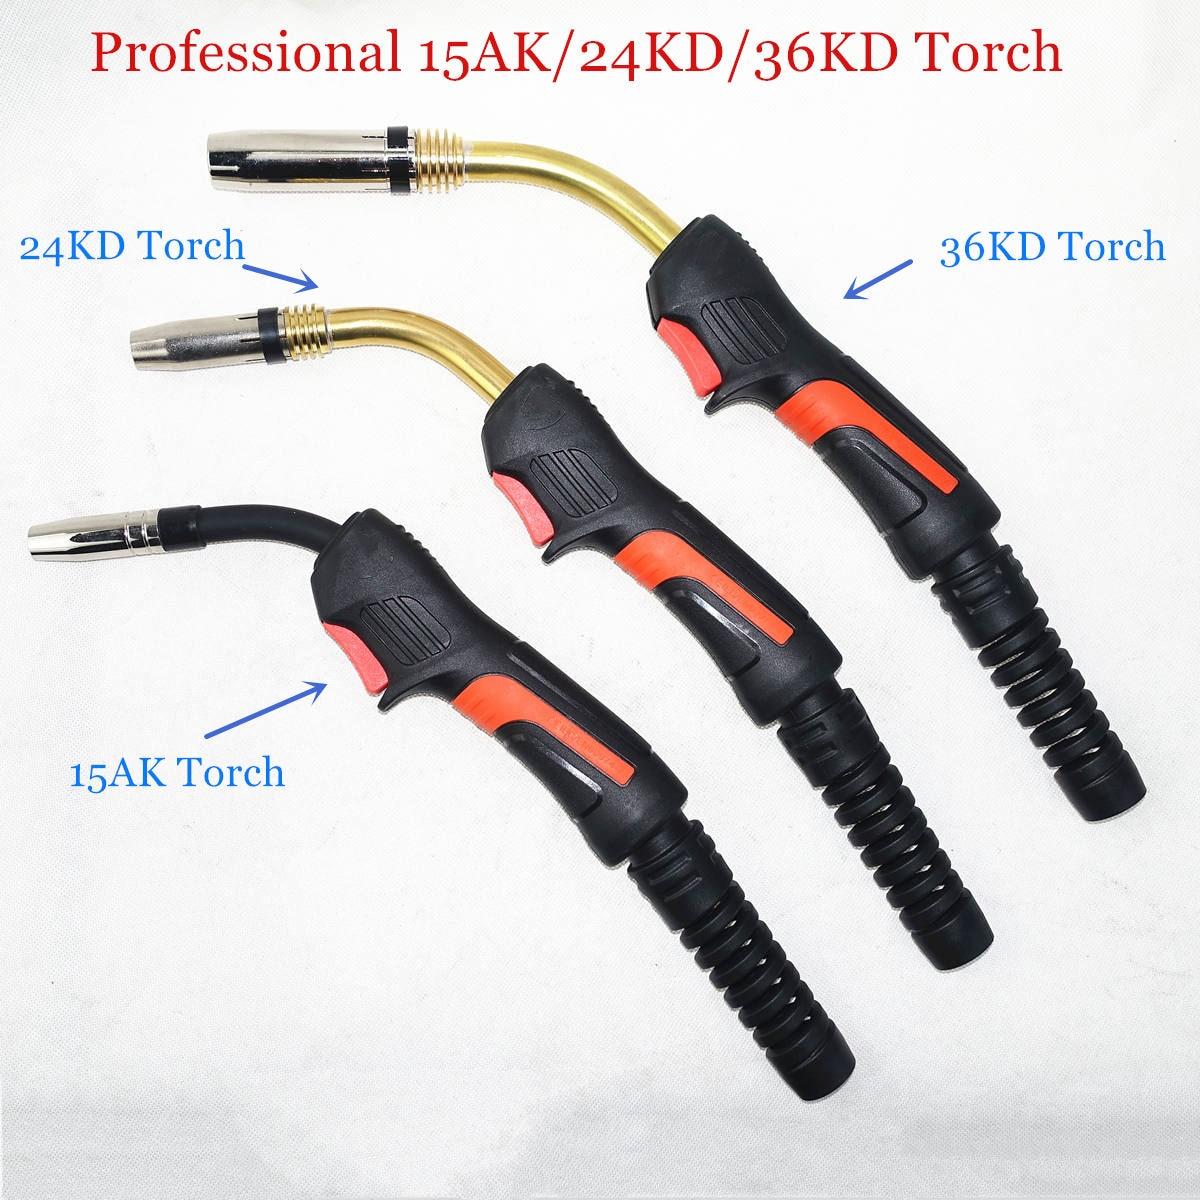 Professional 15AK 24KD 36KD Torch MIG Torch European Style Welding Gun Industrial Level Welding Torch